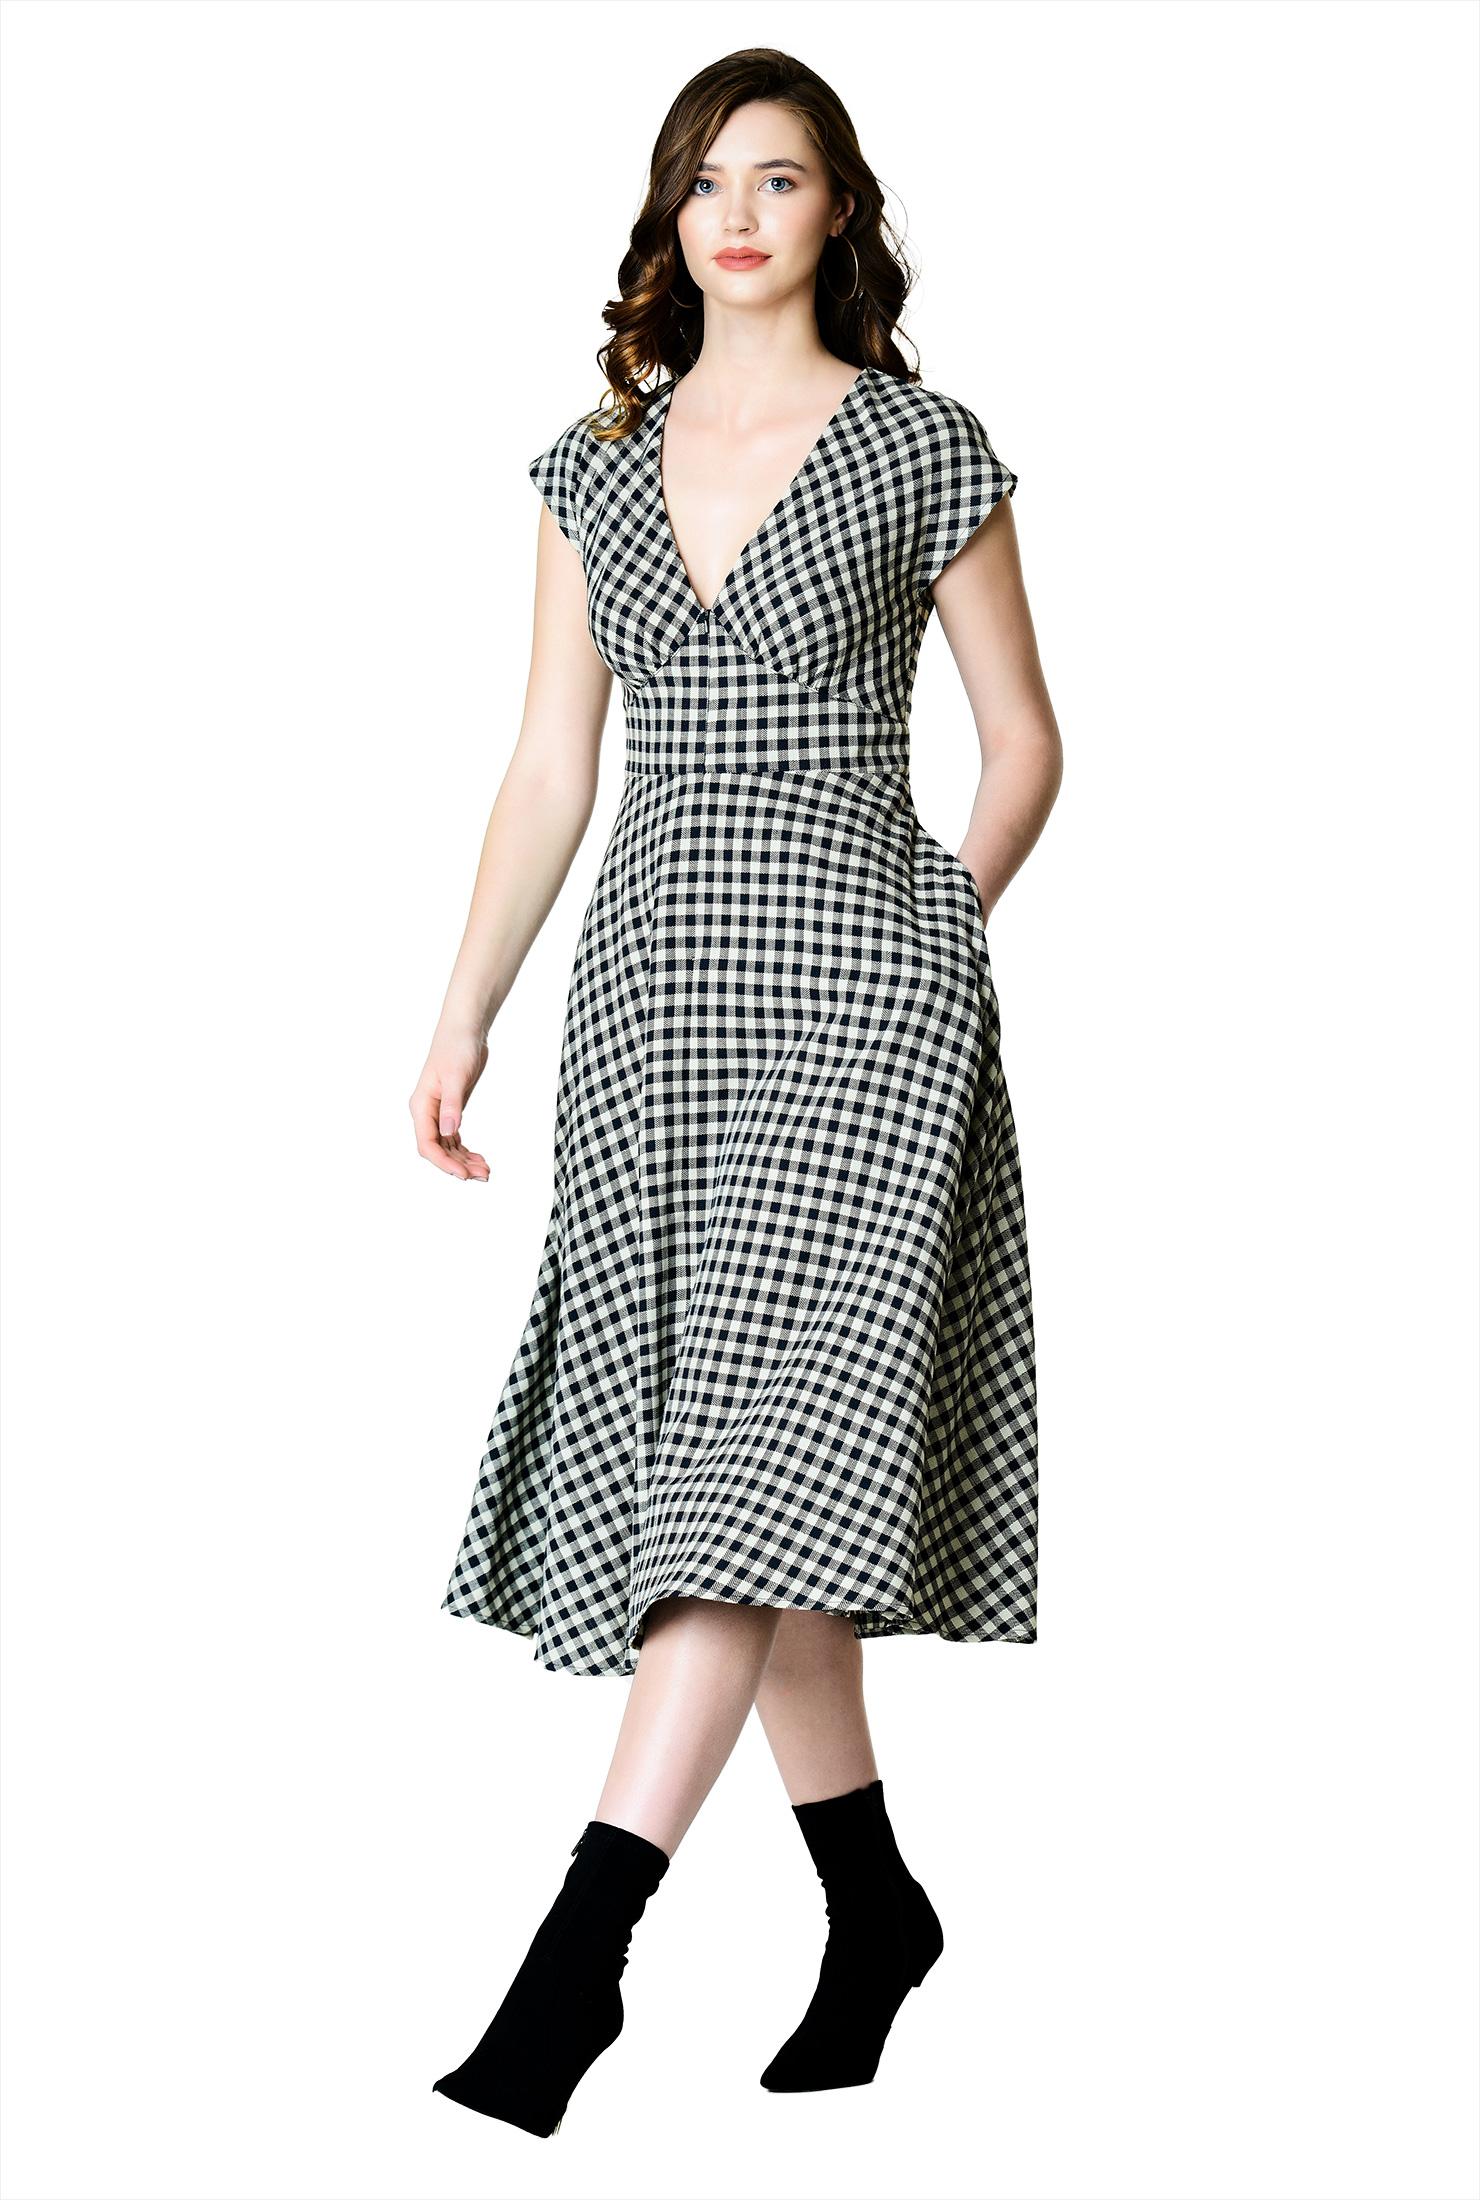 93e6a61ab056 Women s Fashion Clothing 0-36W and Custom